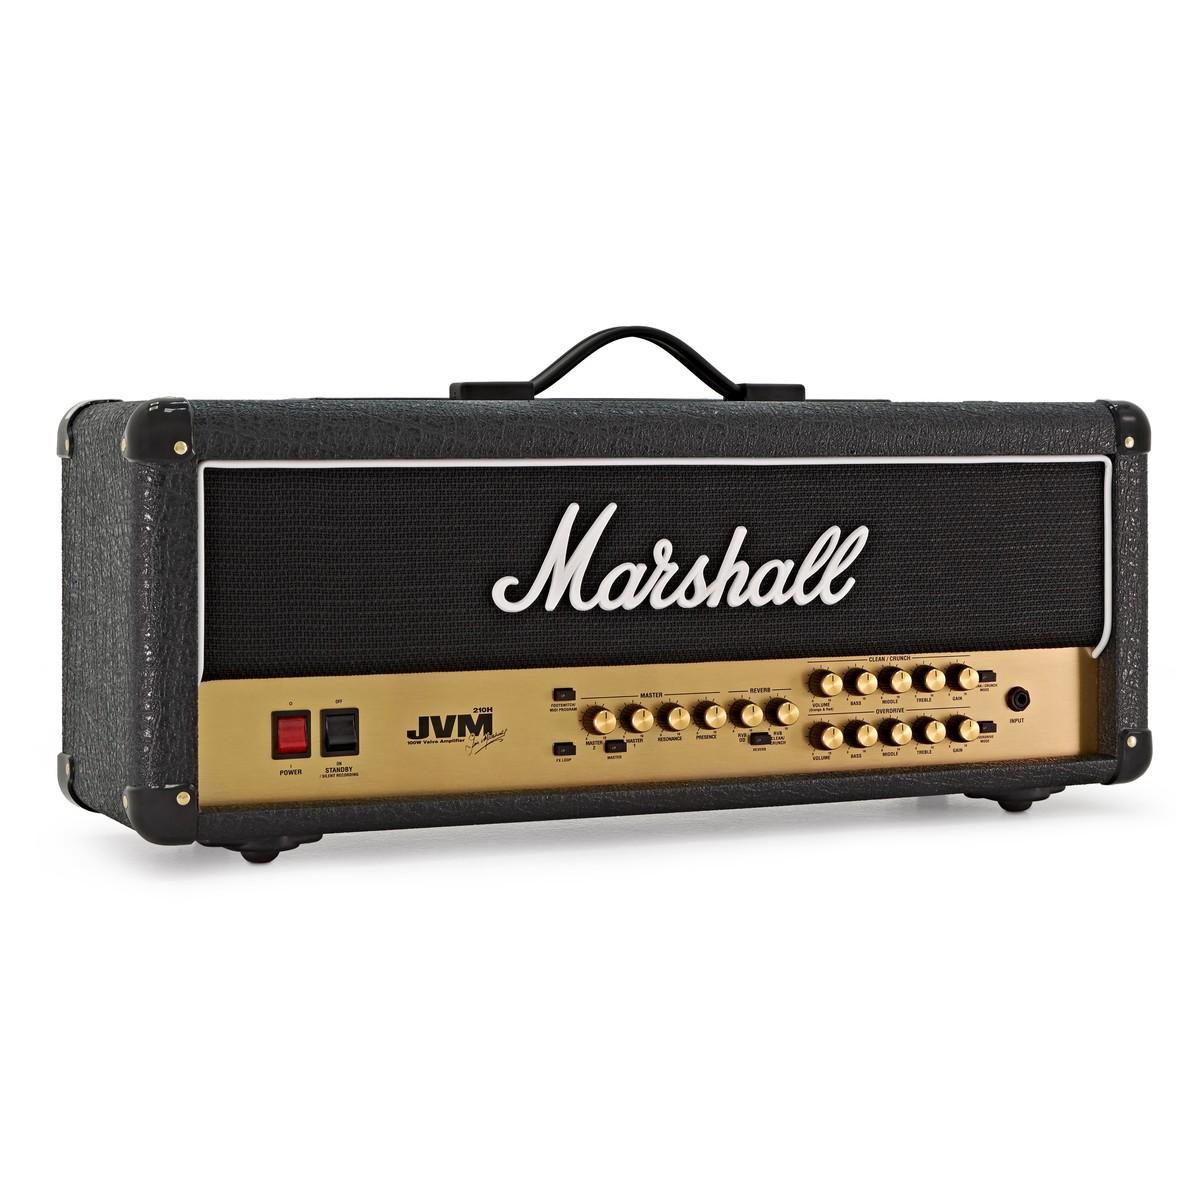 E-Gitarren Topteil Marshall 2555X Silver Jubilee Reissue